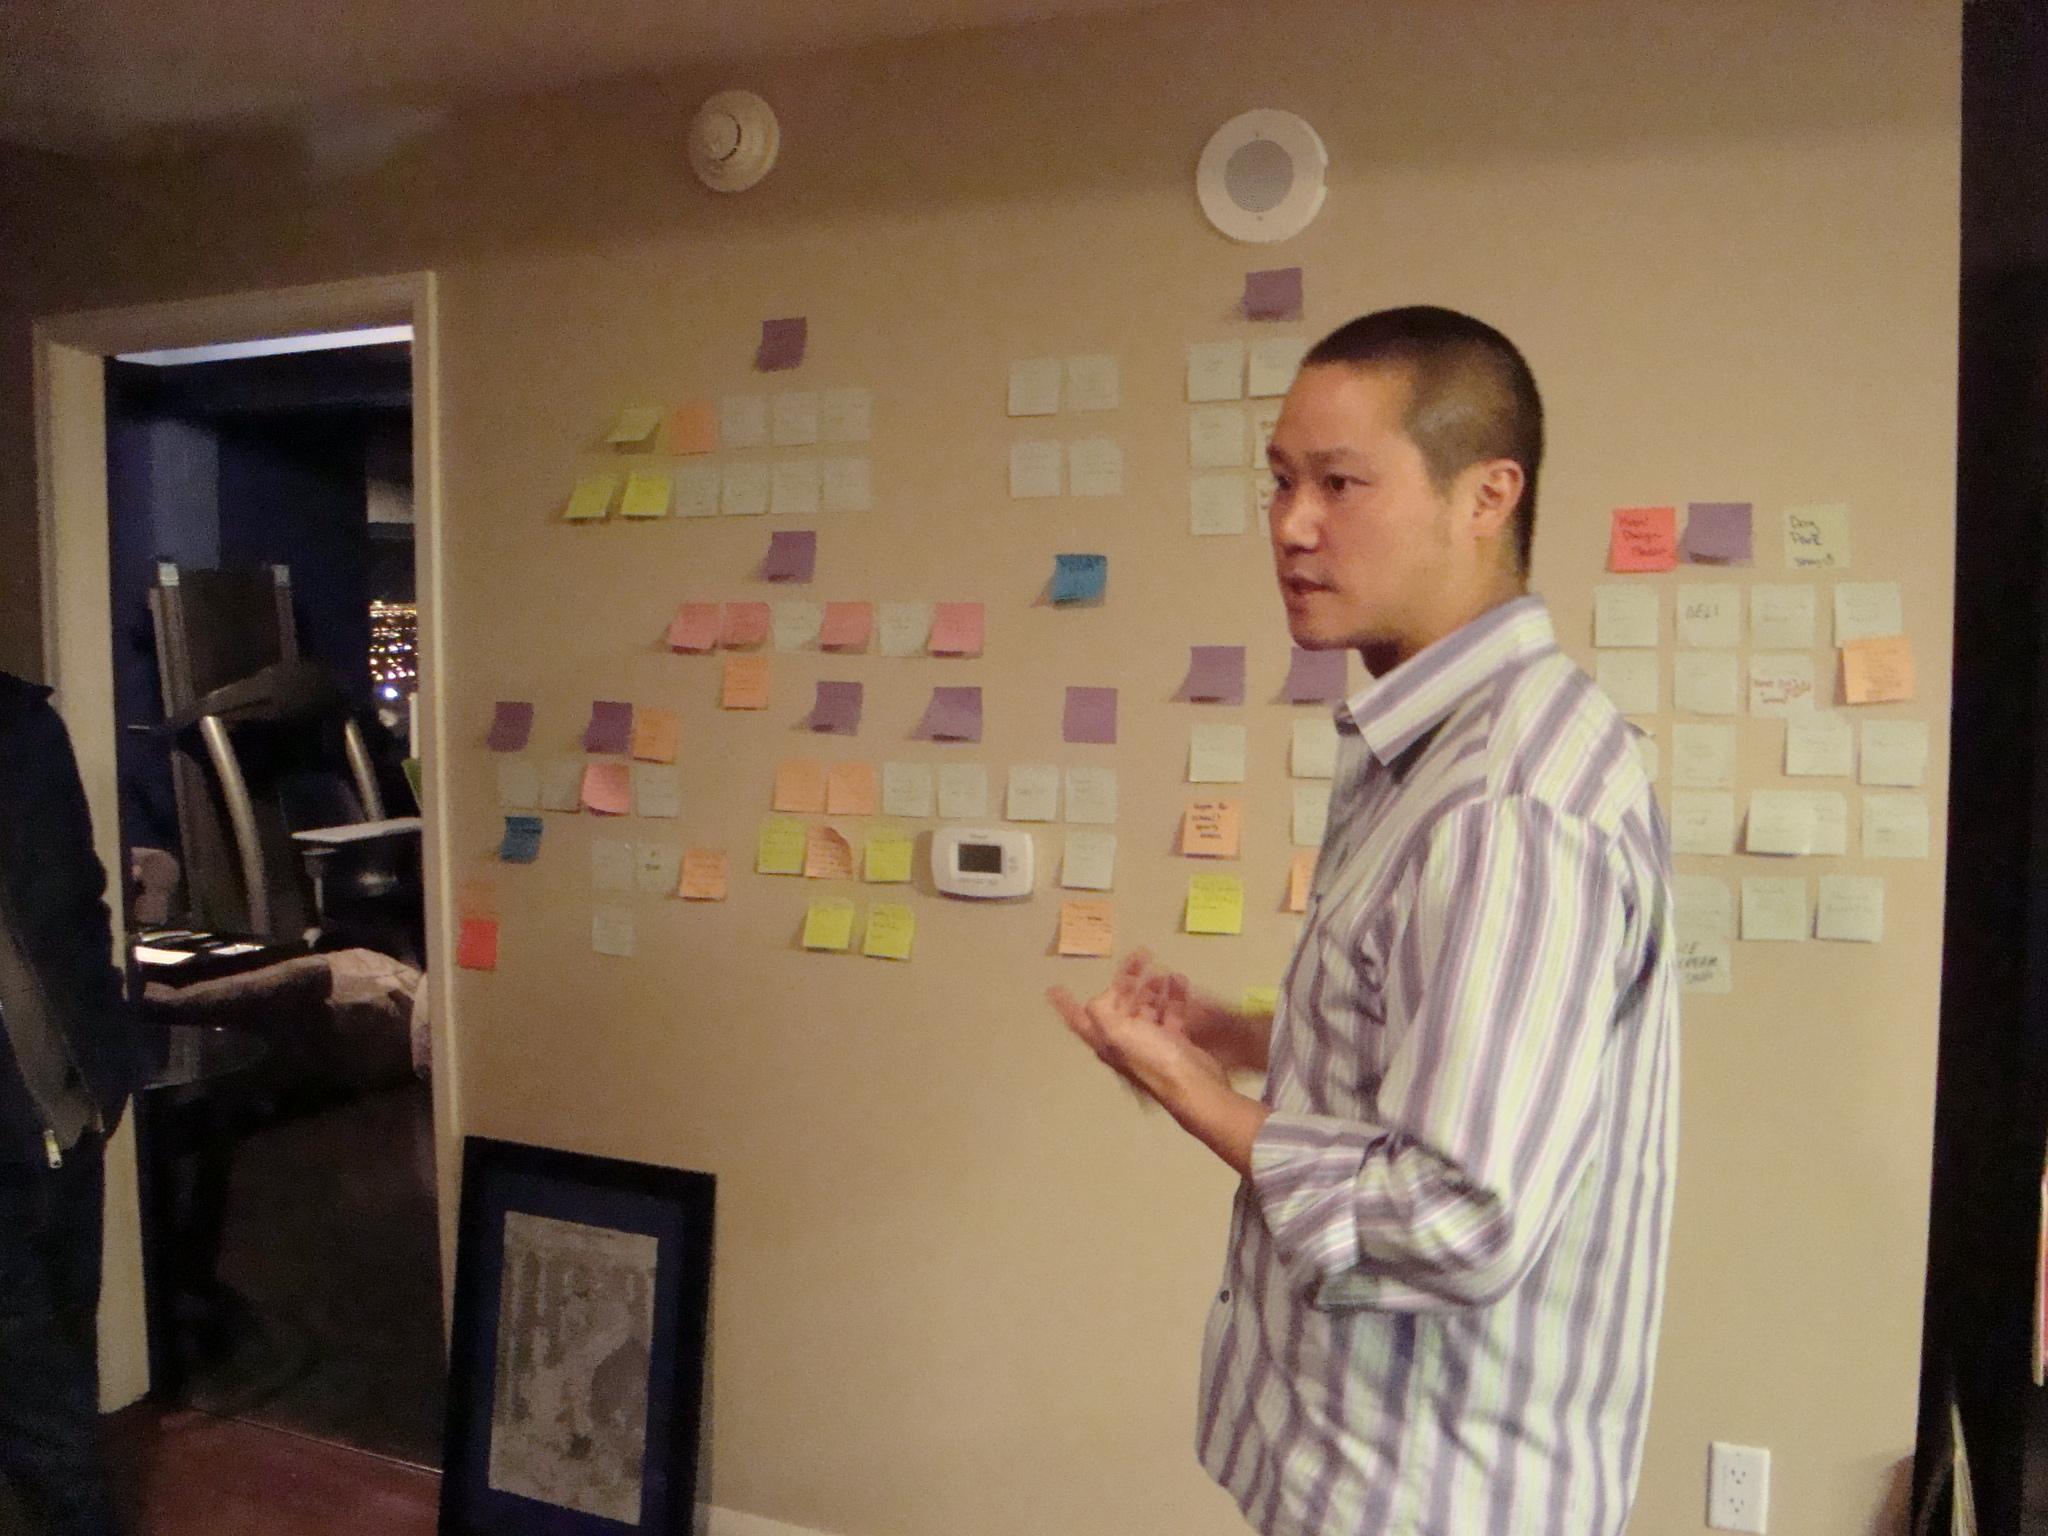 Tony Hsieh Pictures Dec 2011 008